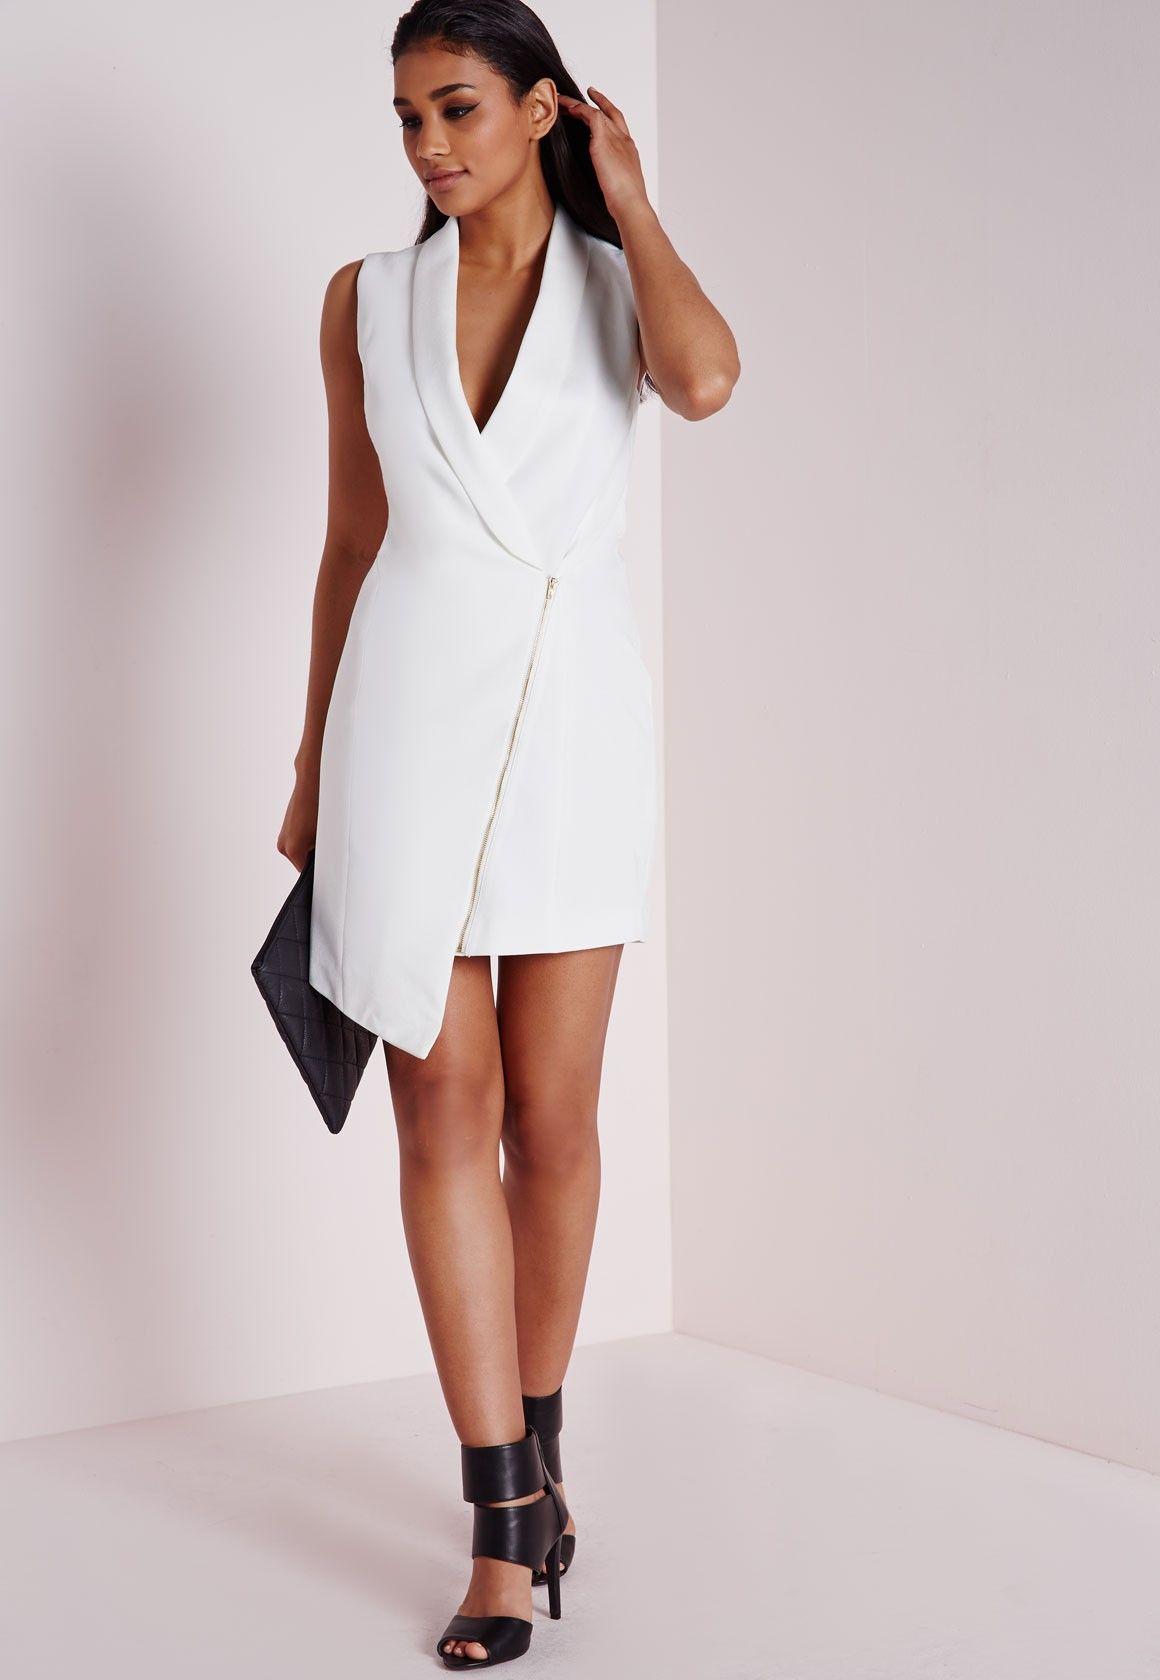 robe blazer sans manches en cr pe blanche robes missguided mode pinterest blazer sans. Black Bedroom Furniture Sets. Home Design Ideas